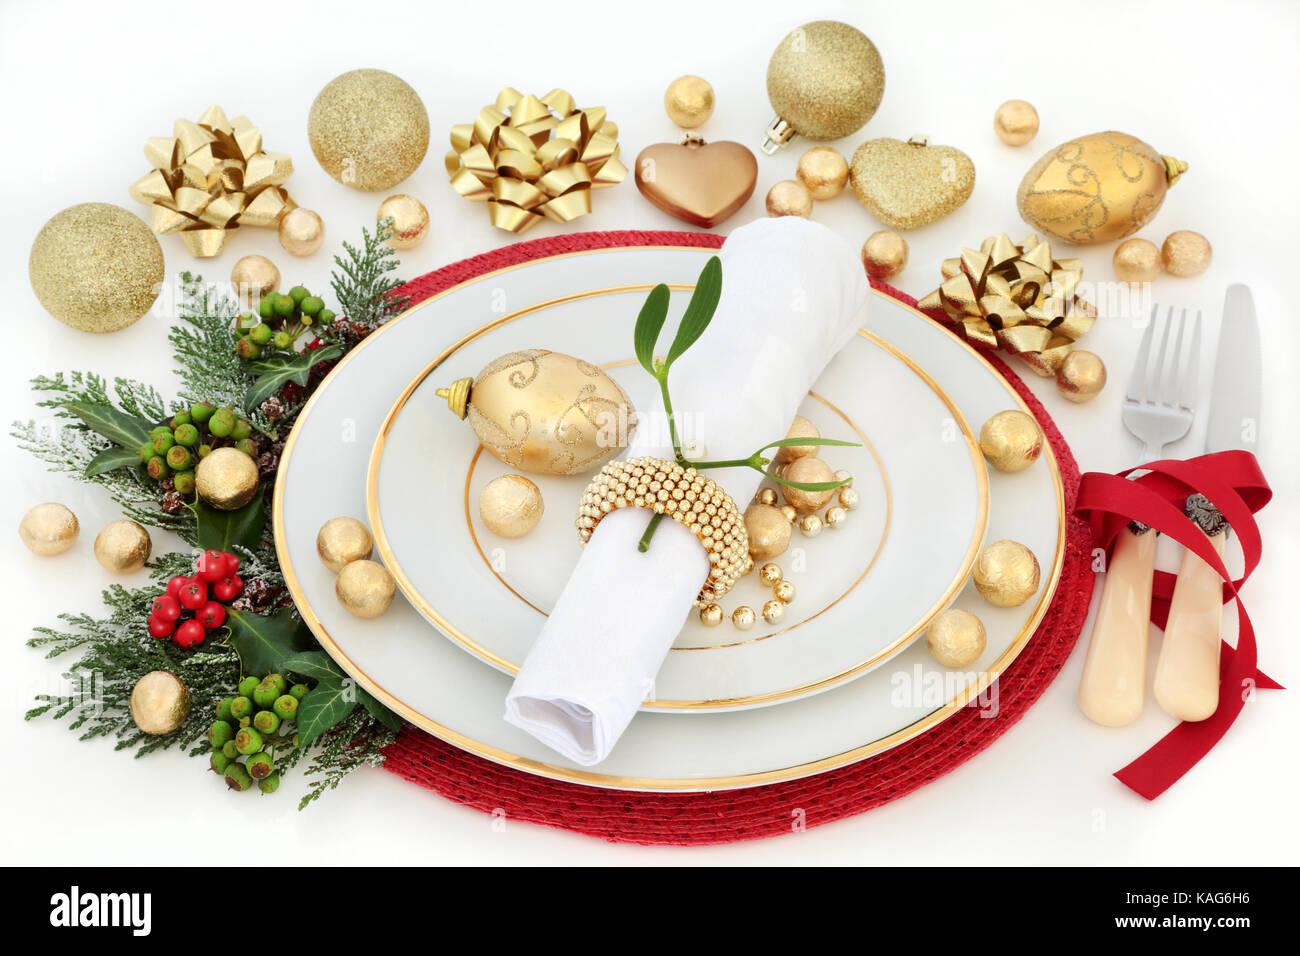 Christmas Dinner Table Setting With Porcelain Plates Napkin